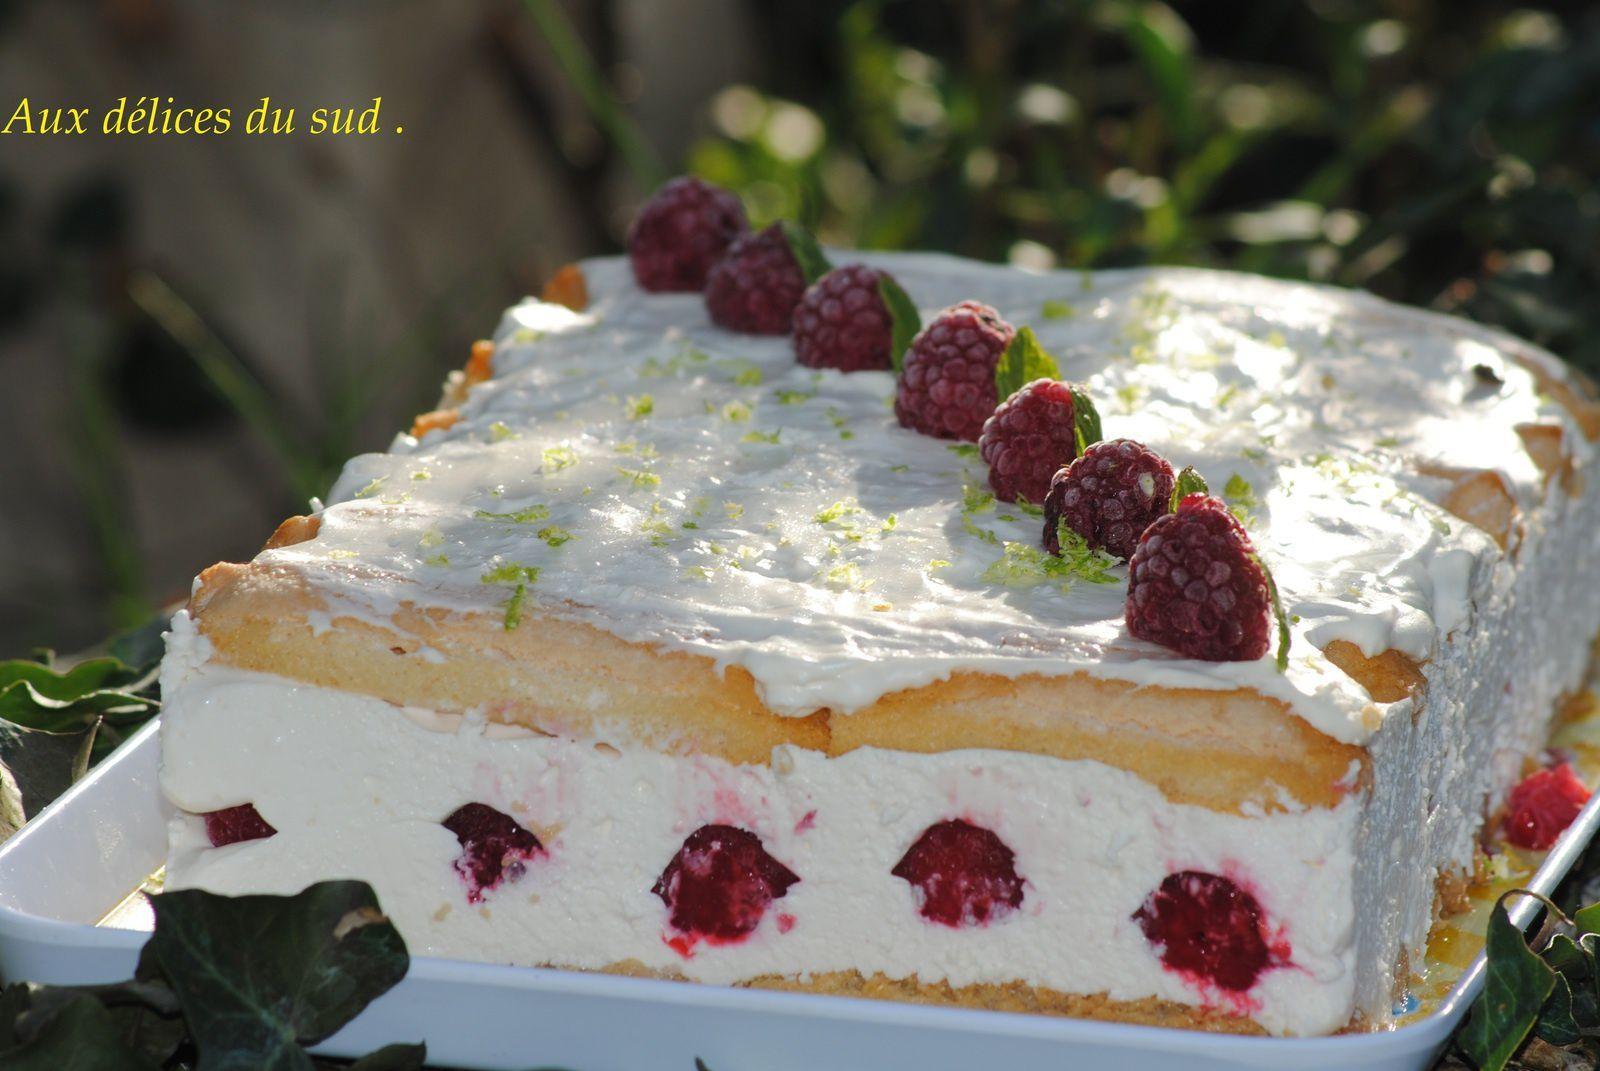 Gâteau tiramisu au citron vert ,framboises .